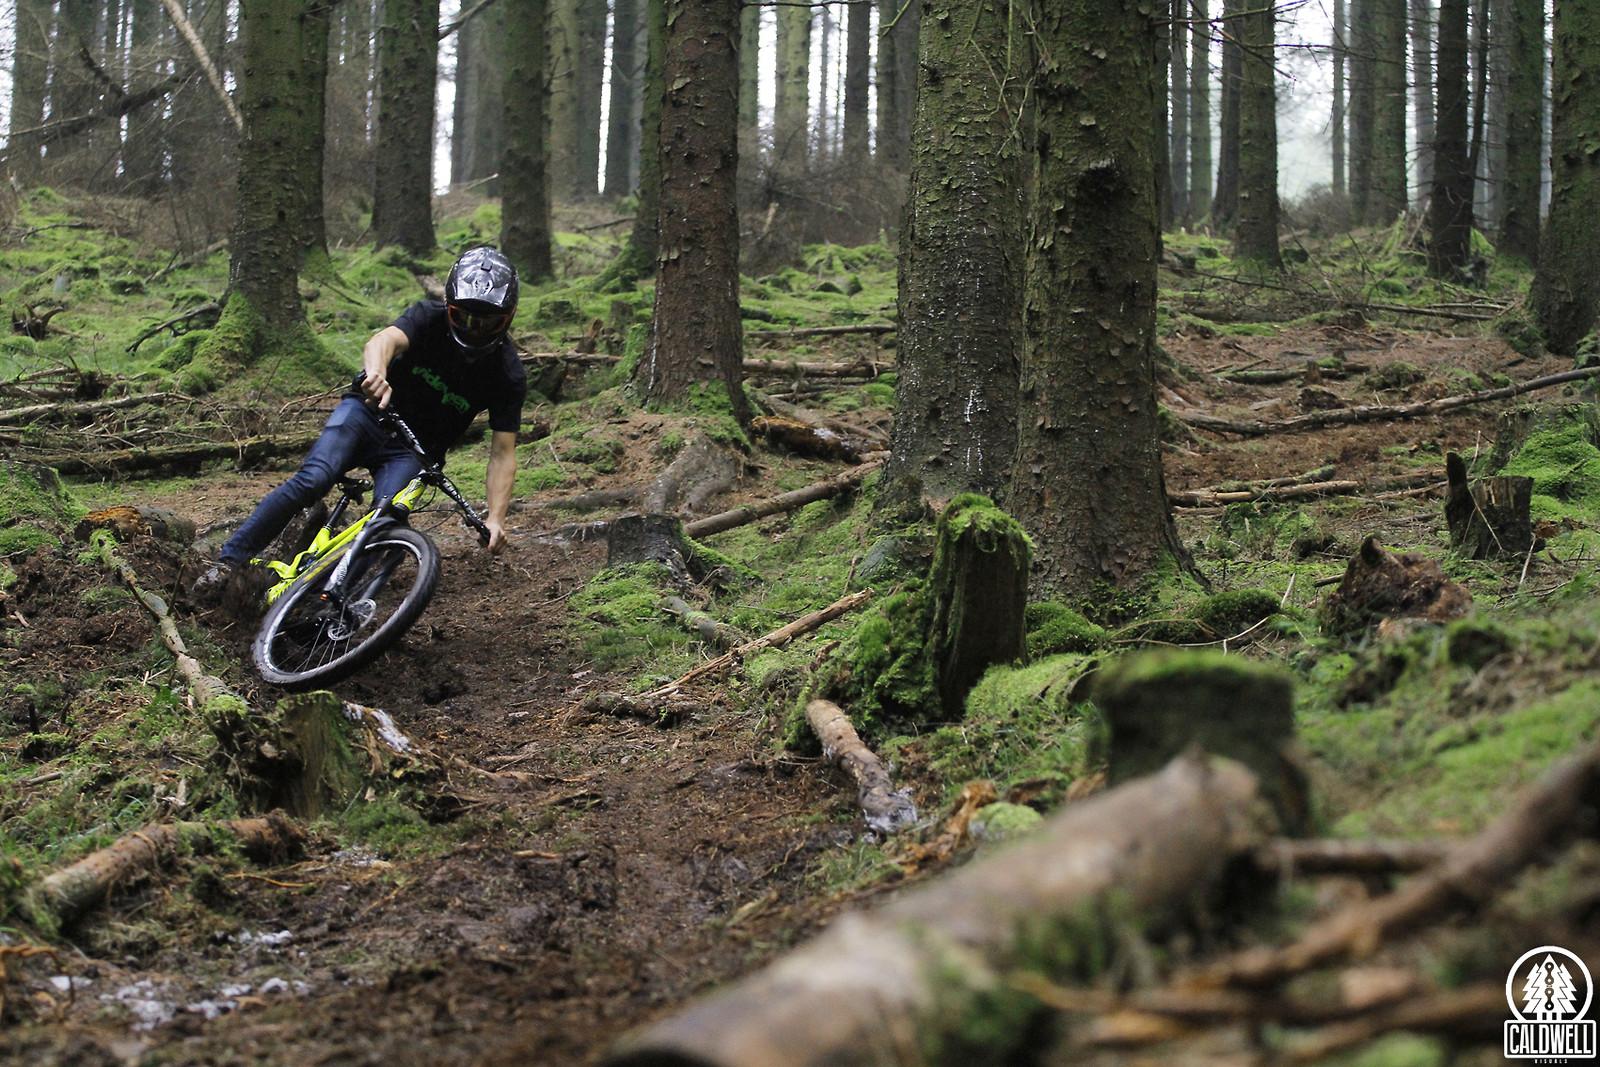 Deep in mossy loam - CaldwellVisuals - Mountain Biking Pictures - Vital MTB